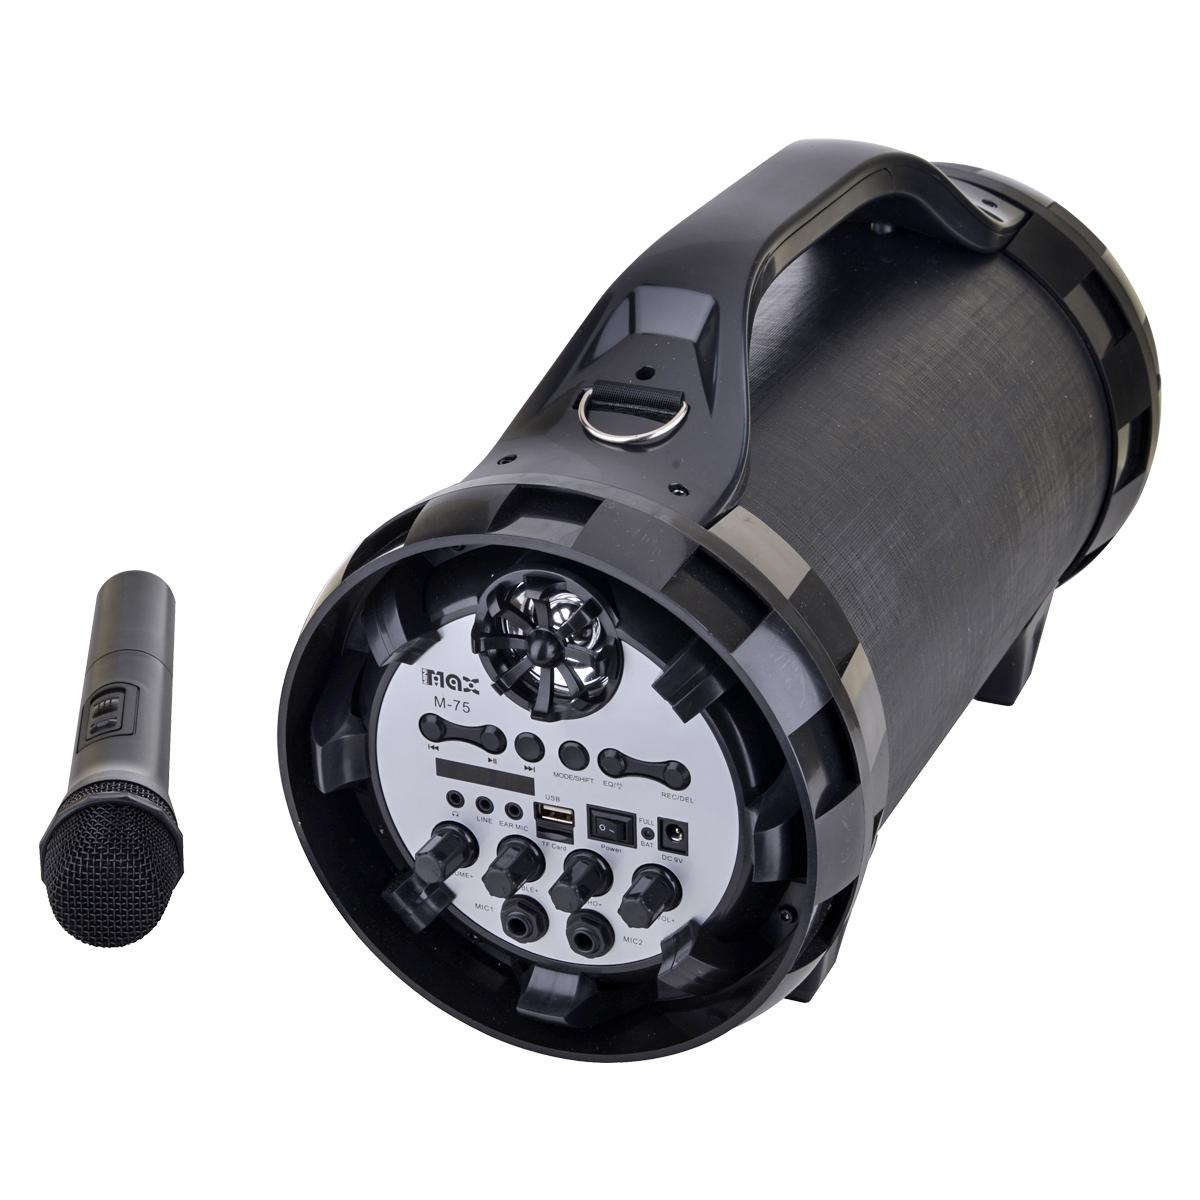 مكبر صوت بلوتوث قابل للشحن MAX-M-75